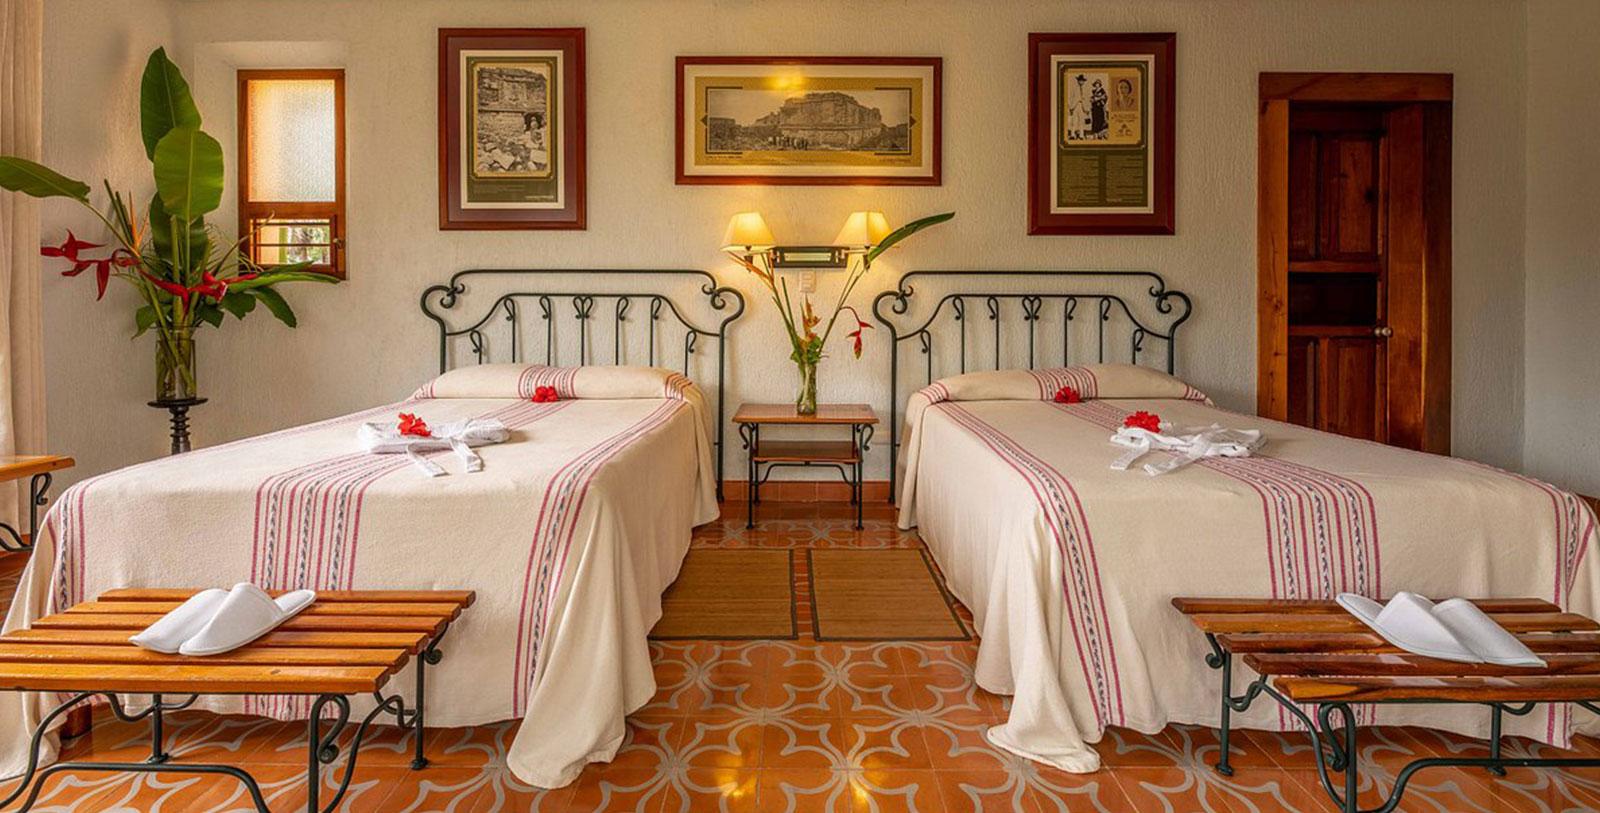 Image of Guestroom Interior, Hacienda Uxmal Plantation & Museum, Member of Historic Hotels Worldwide, Accommodations